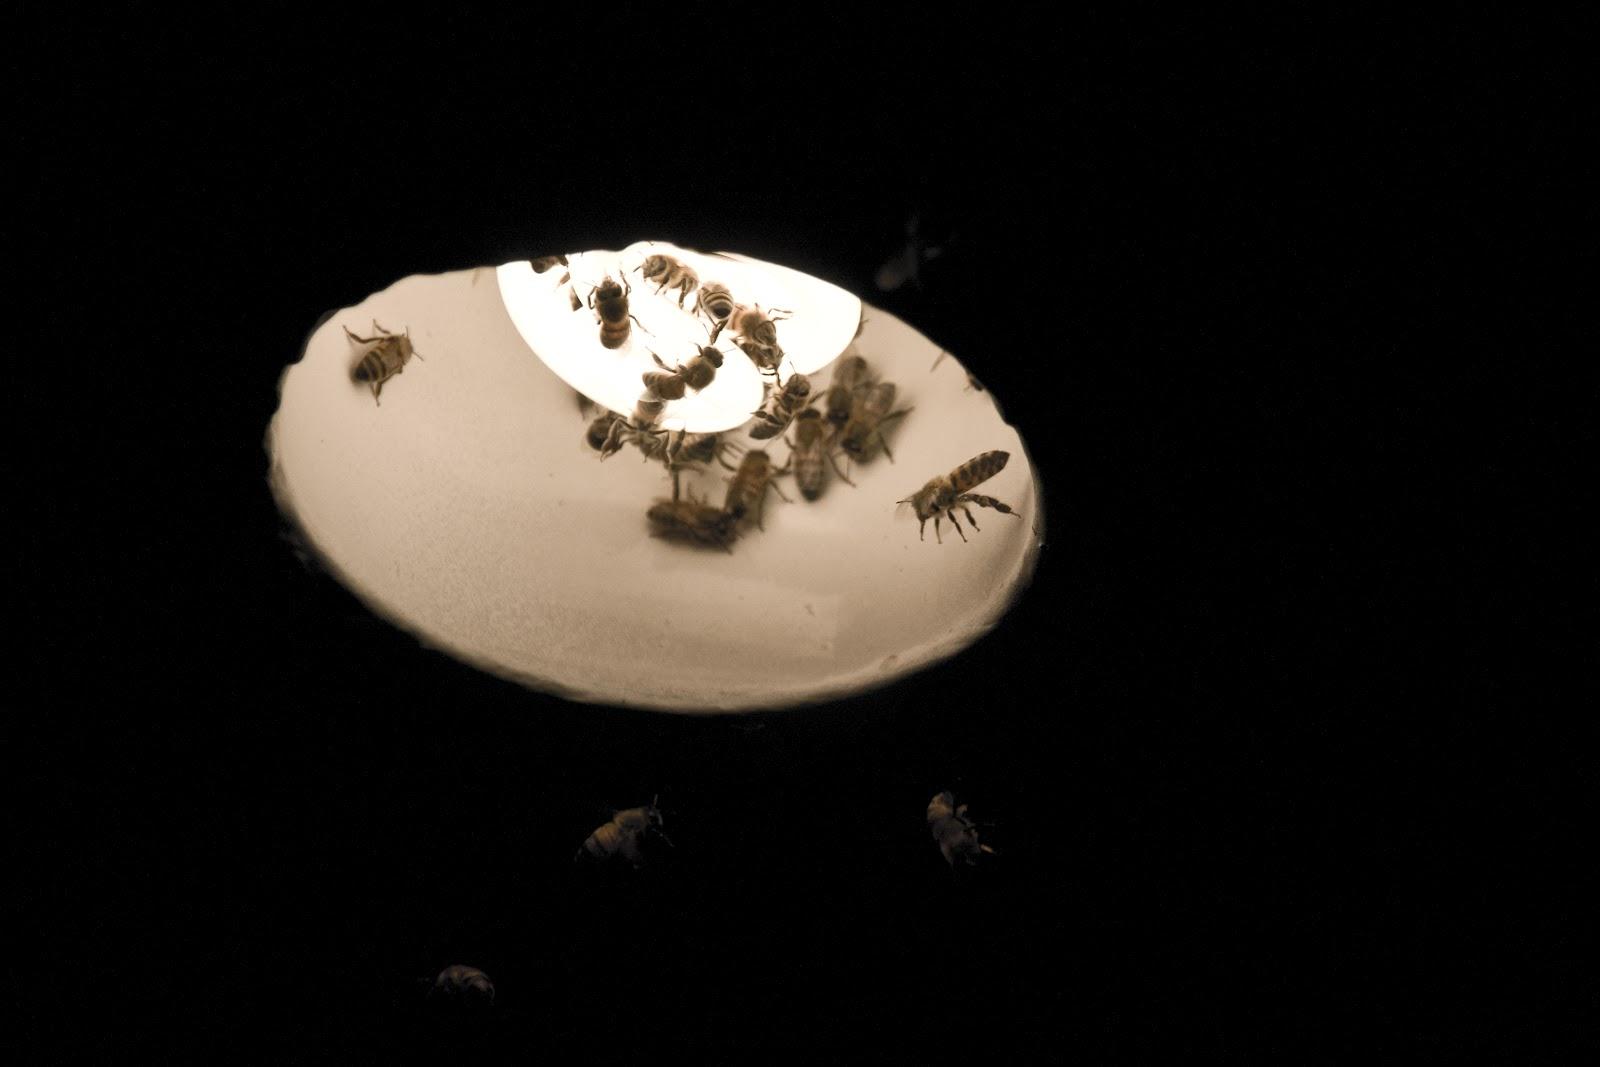 Lighting a Bee's Nest on Fire | Surf Micke